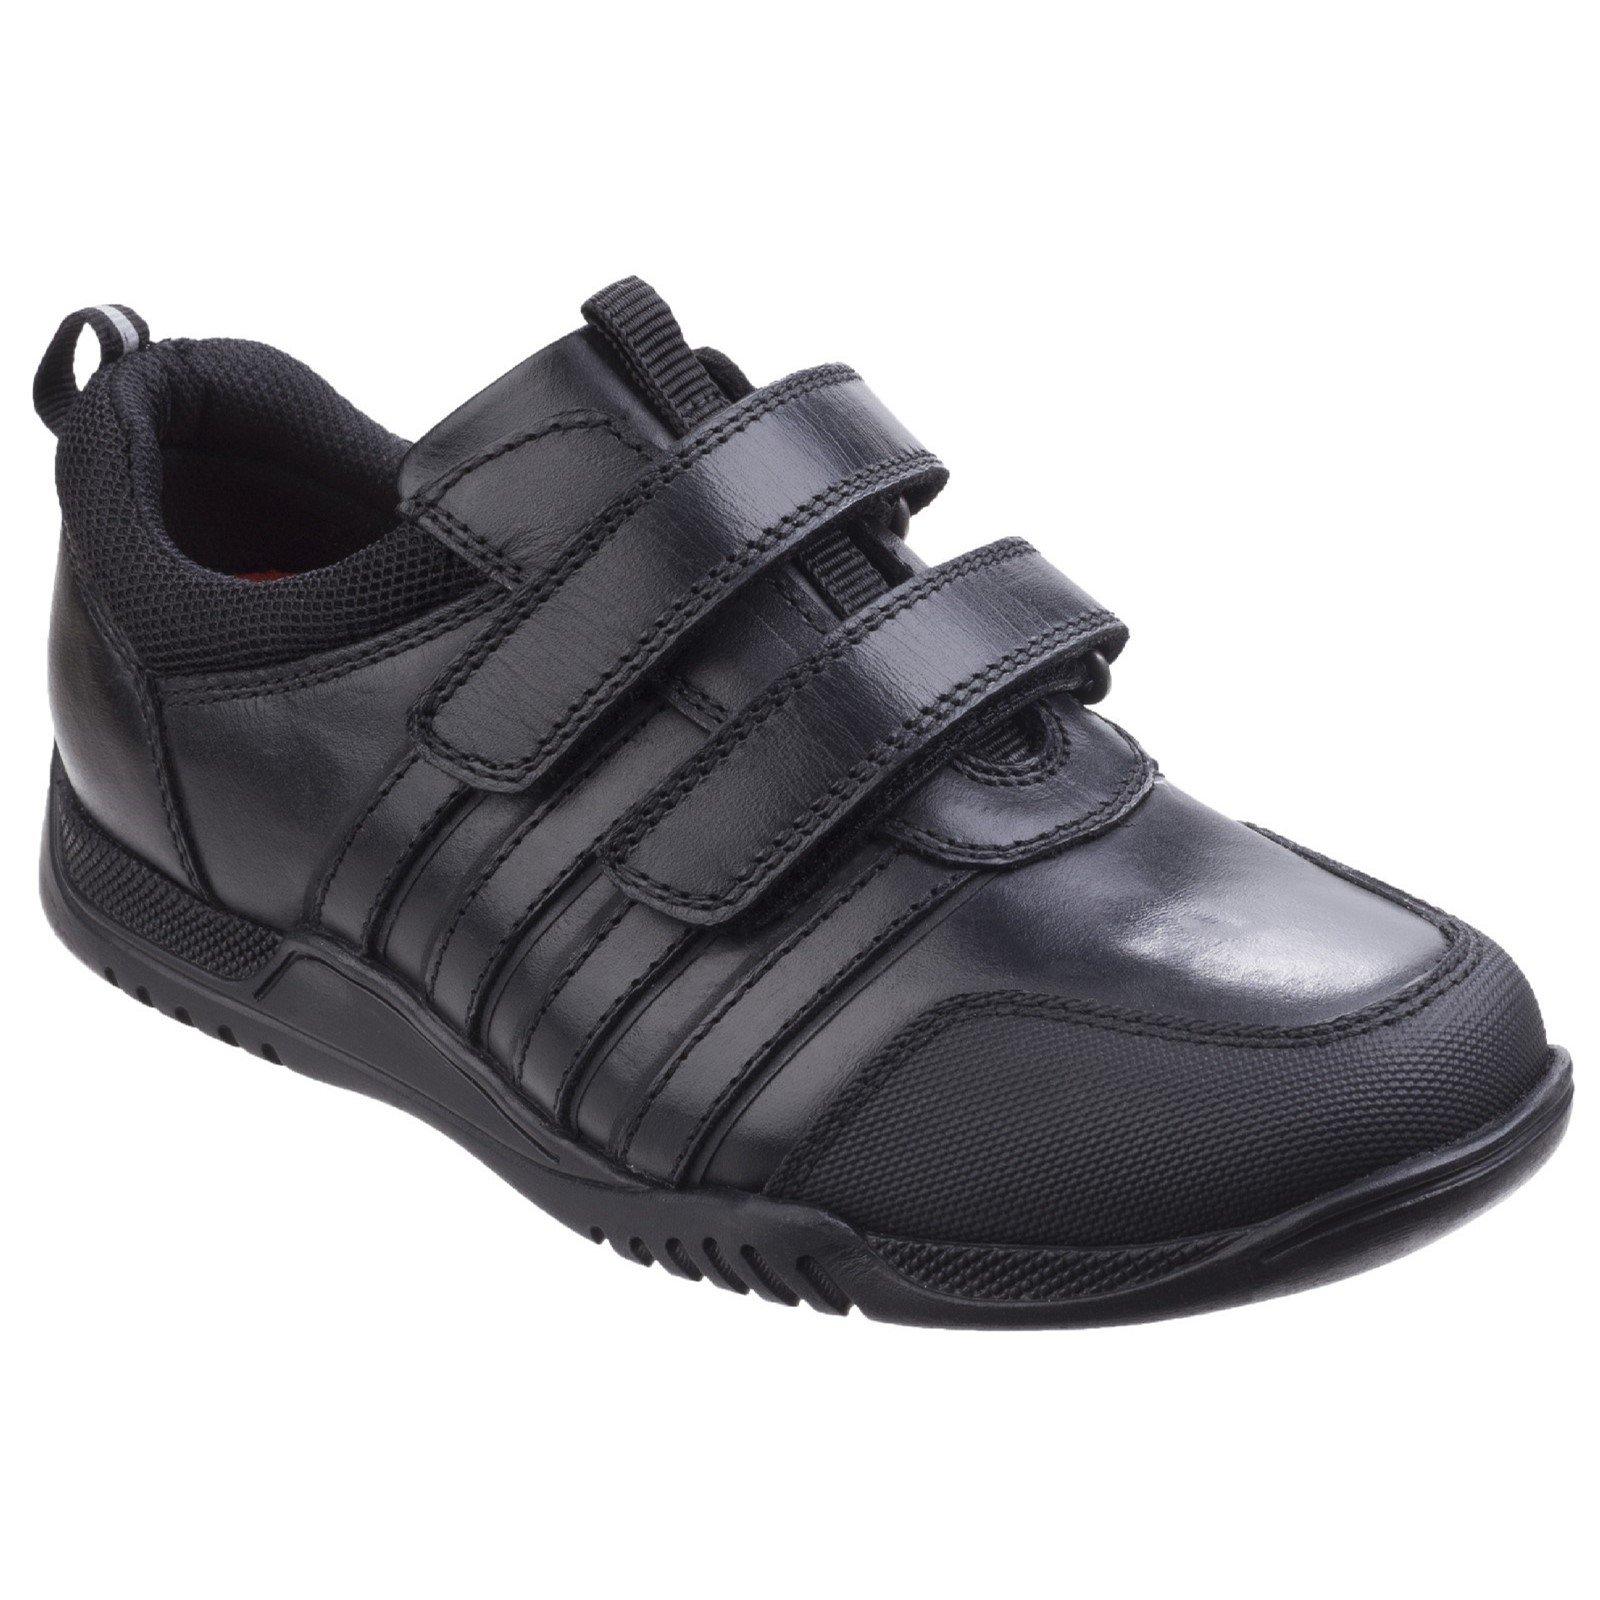 Hush Puppies Kid's Josh Senior School Shoe Black 26396 - Black 3.5